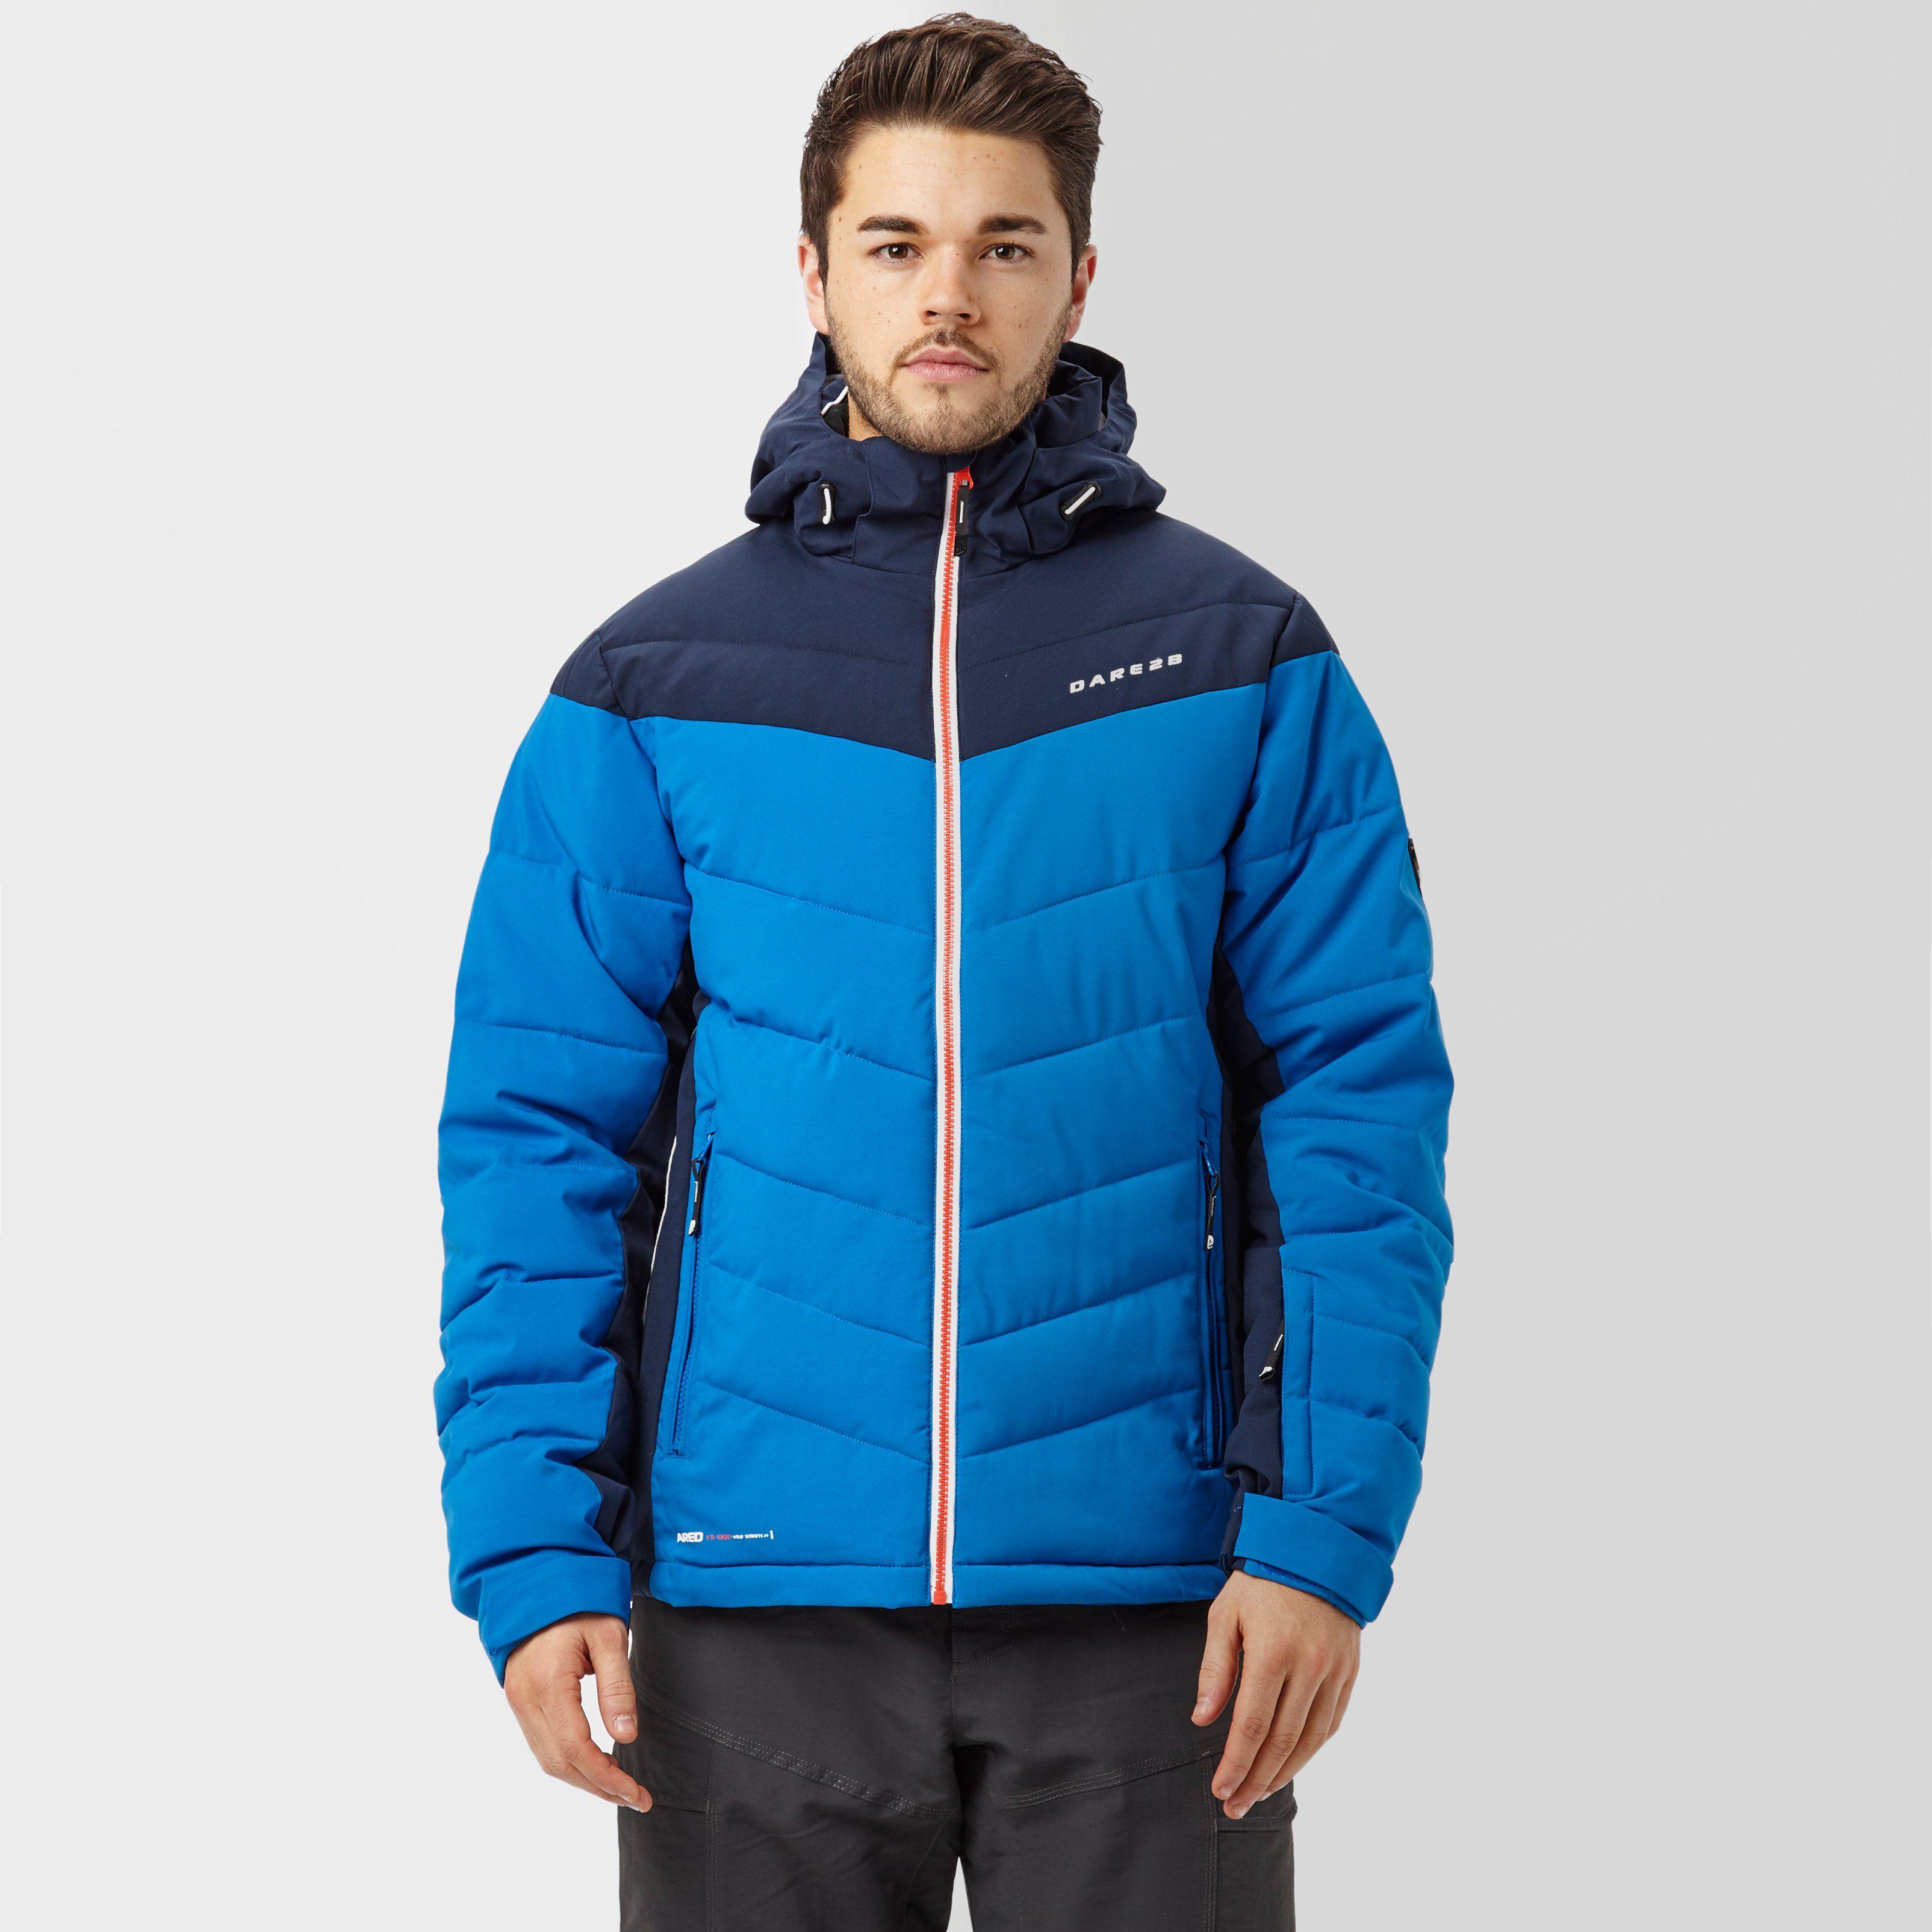 DARE 2B Men's Intention Ski Jacket